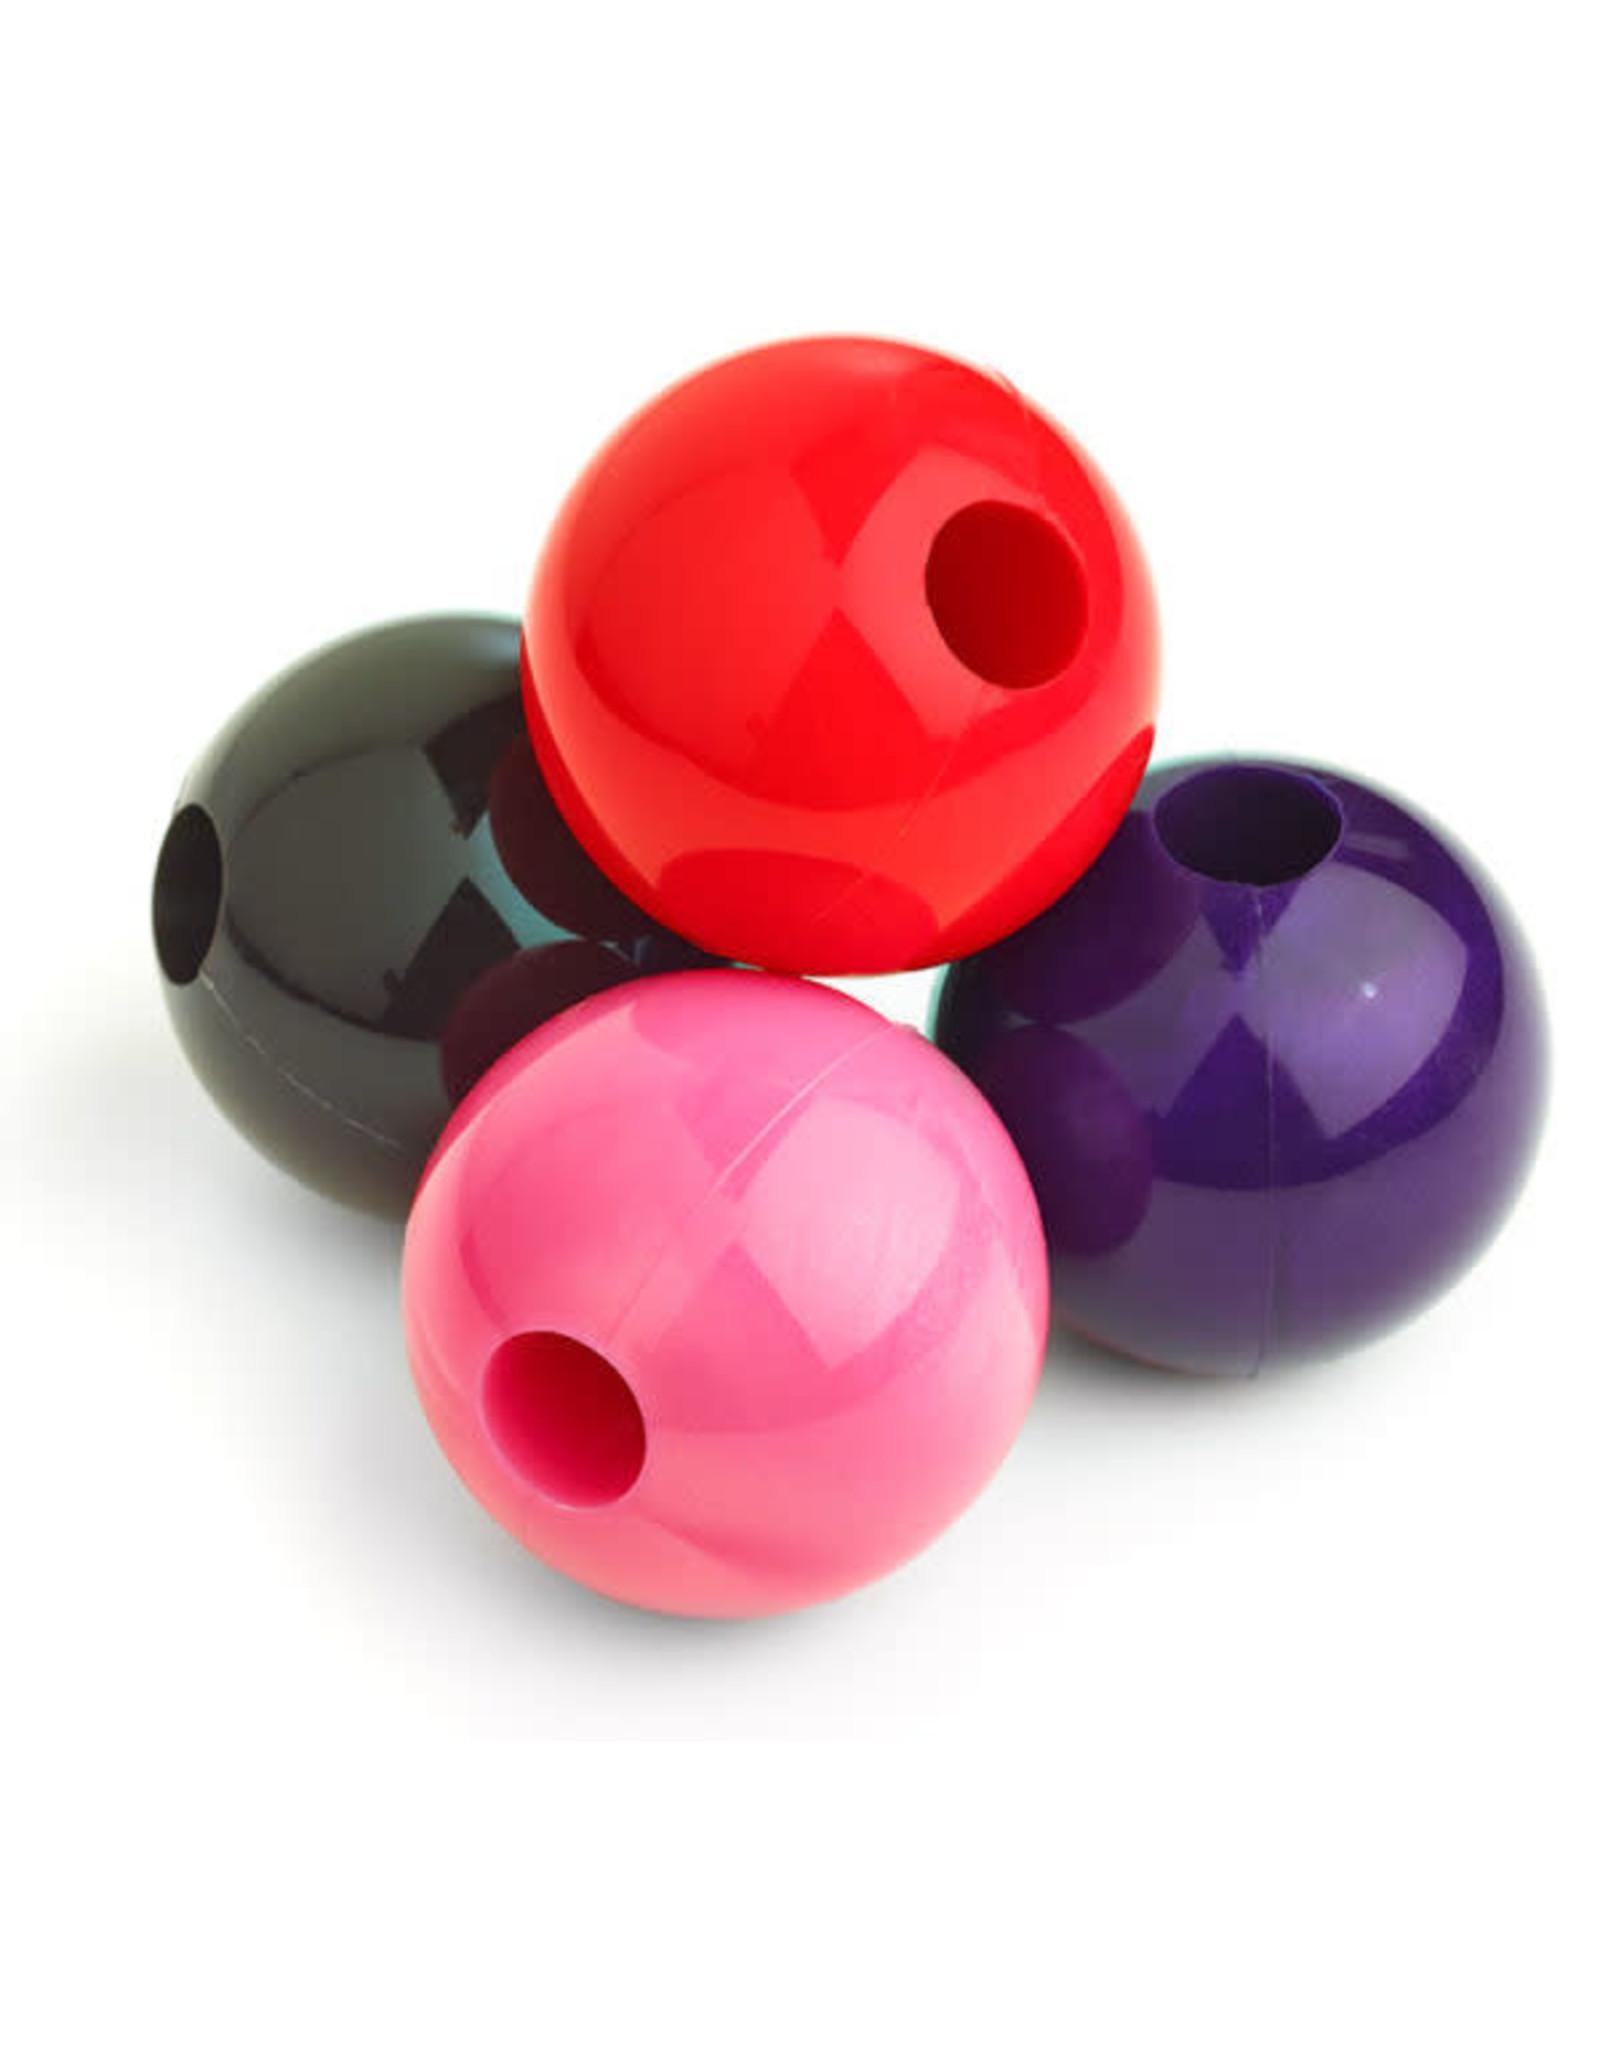 FUZE - BALL GAG - PURPLE